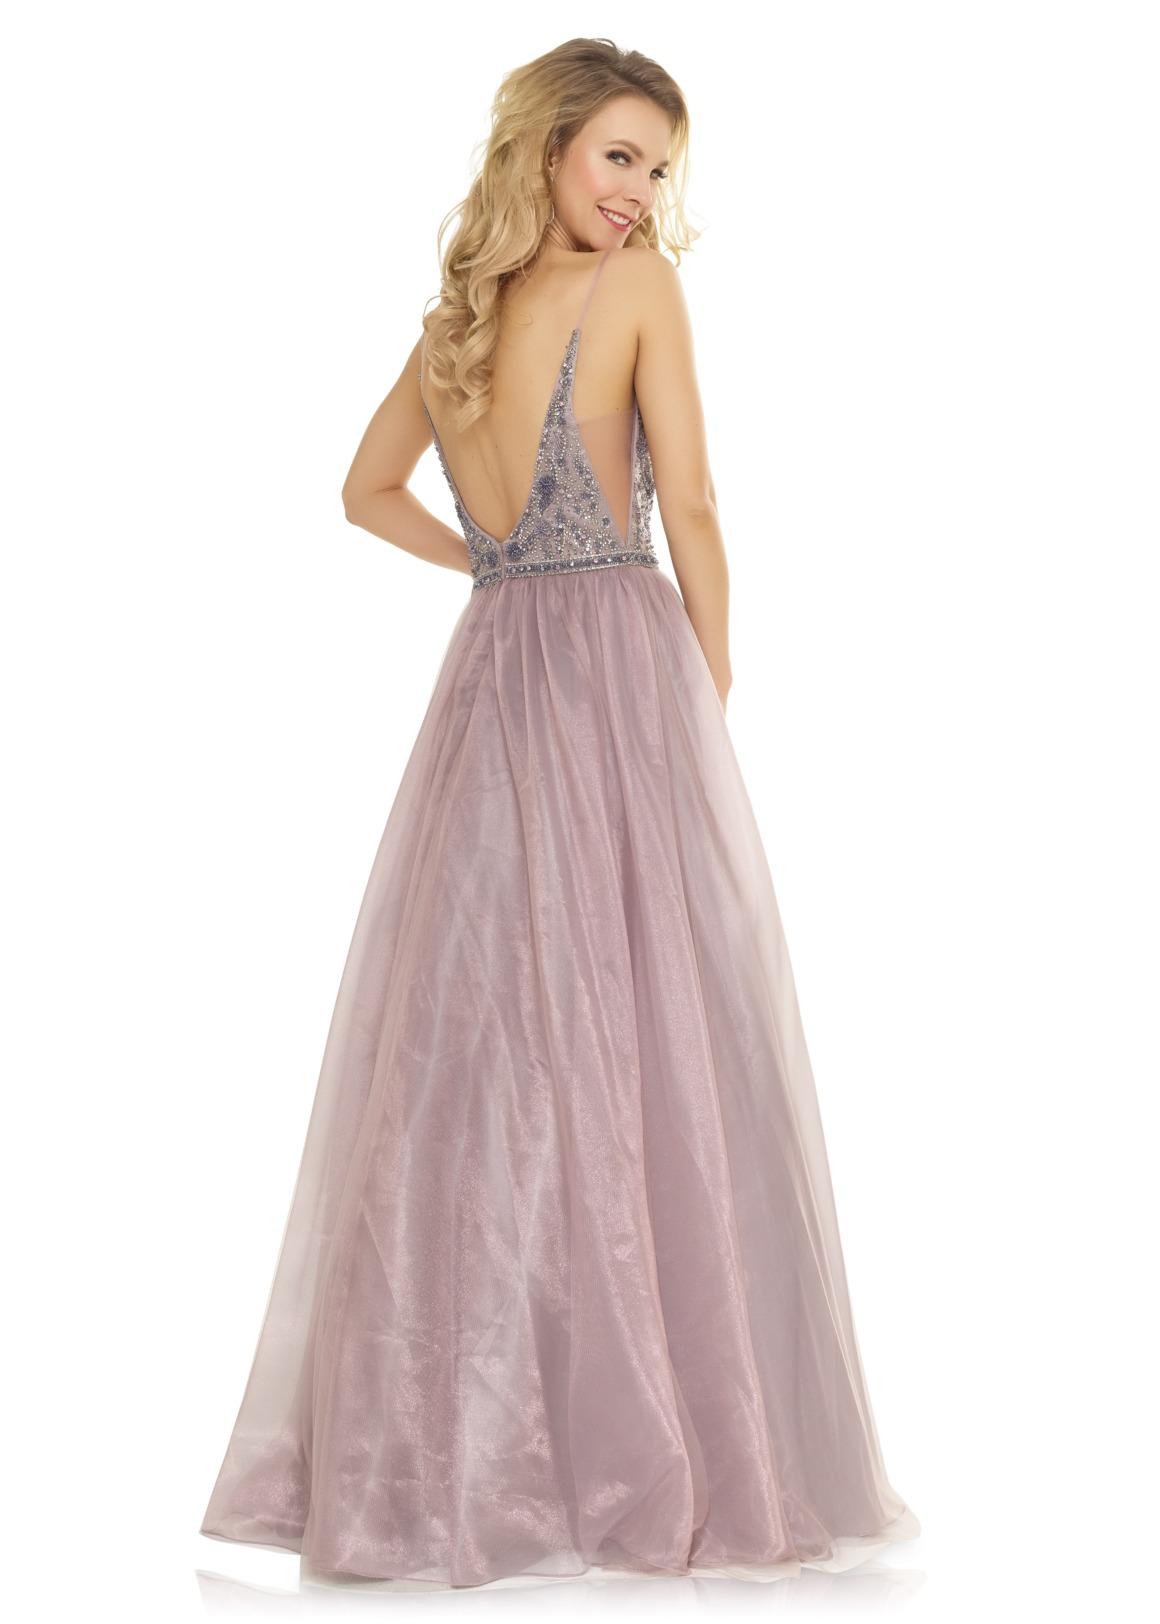 Schützenfest Königinnenkleid Hofdamen Hofstaat Kleid rose mauve toller Rücken Tüllrock elegant glitzer V-Ausschnitt